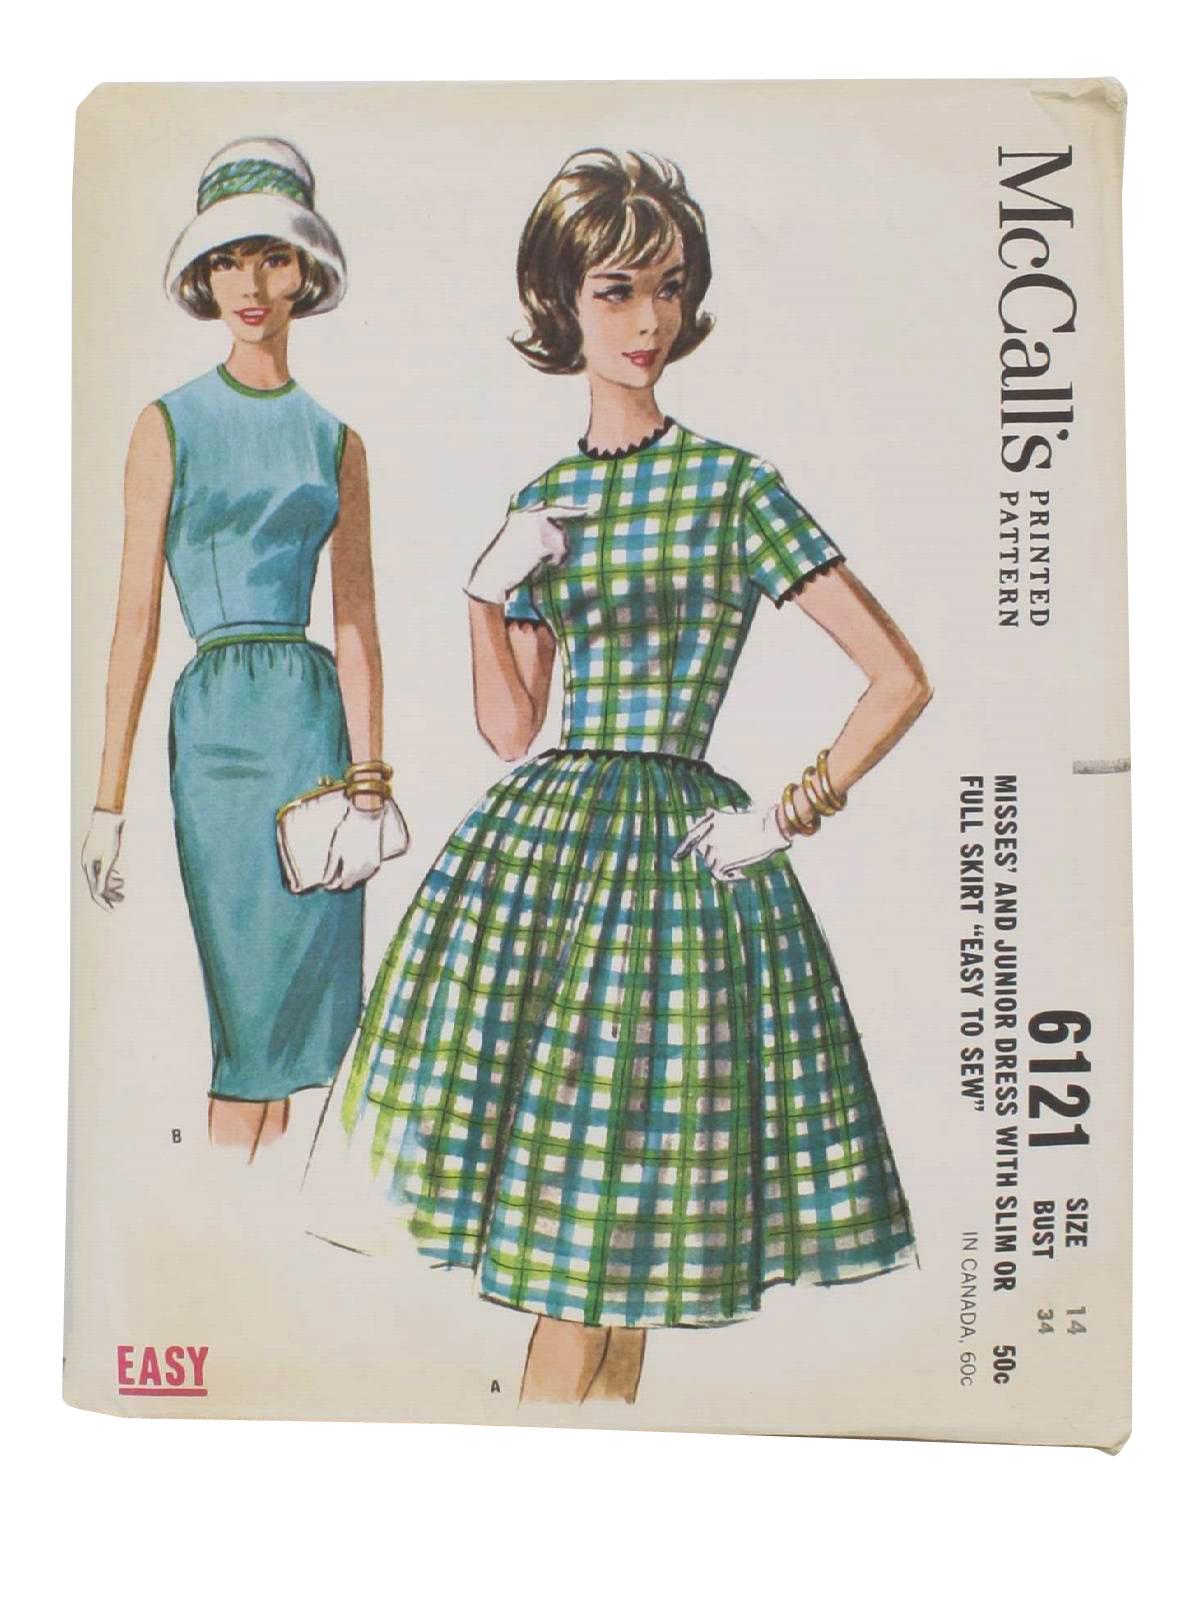 Vintage Mccalls Pattern No 6121 Sixties Sewing Pattern